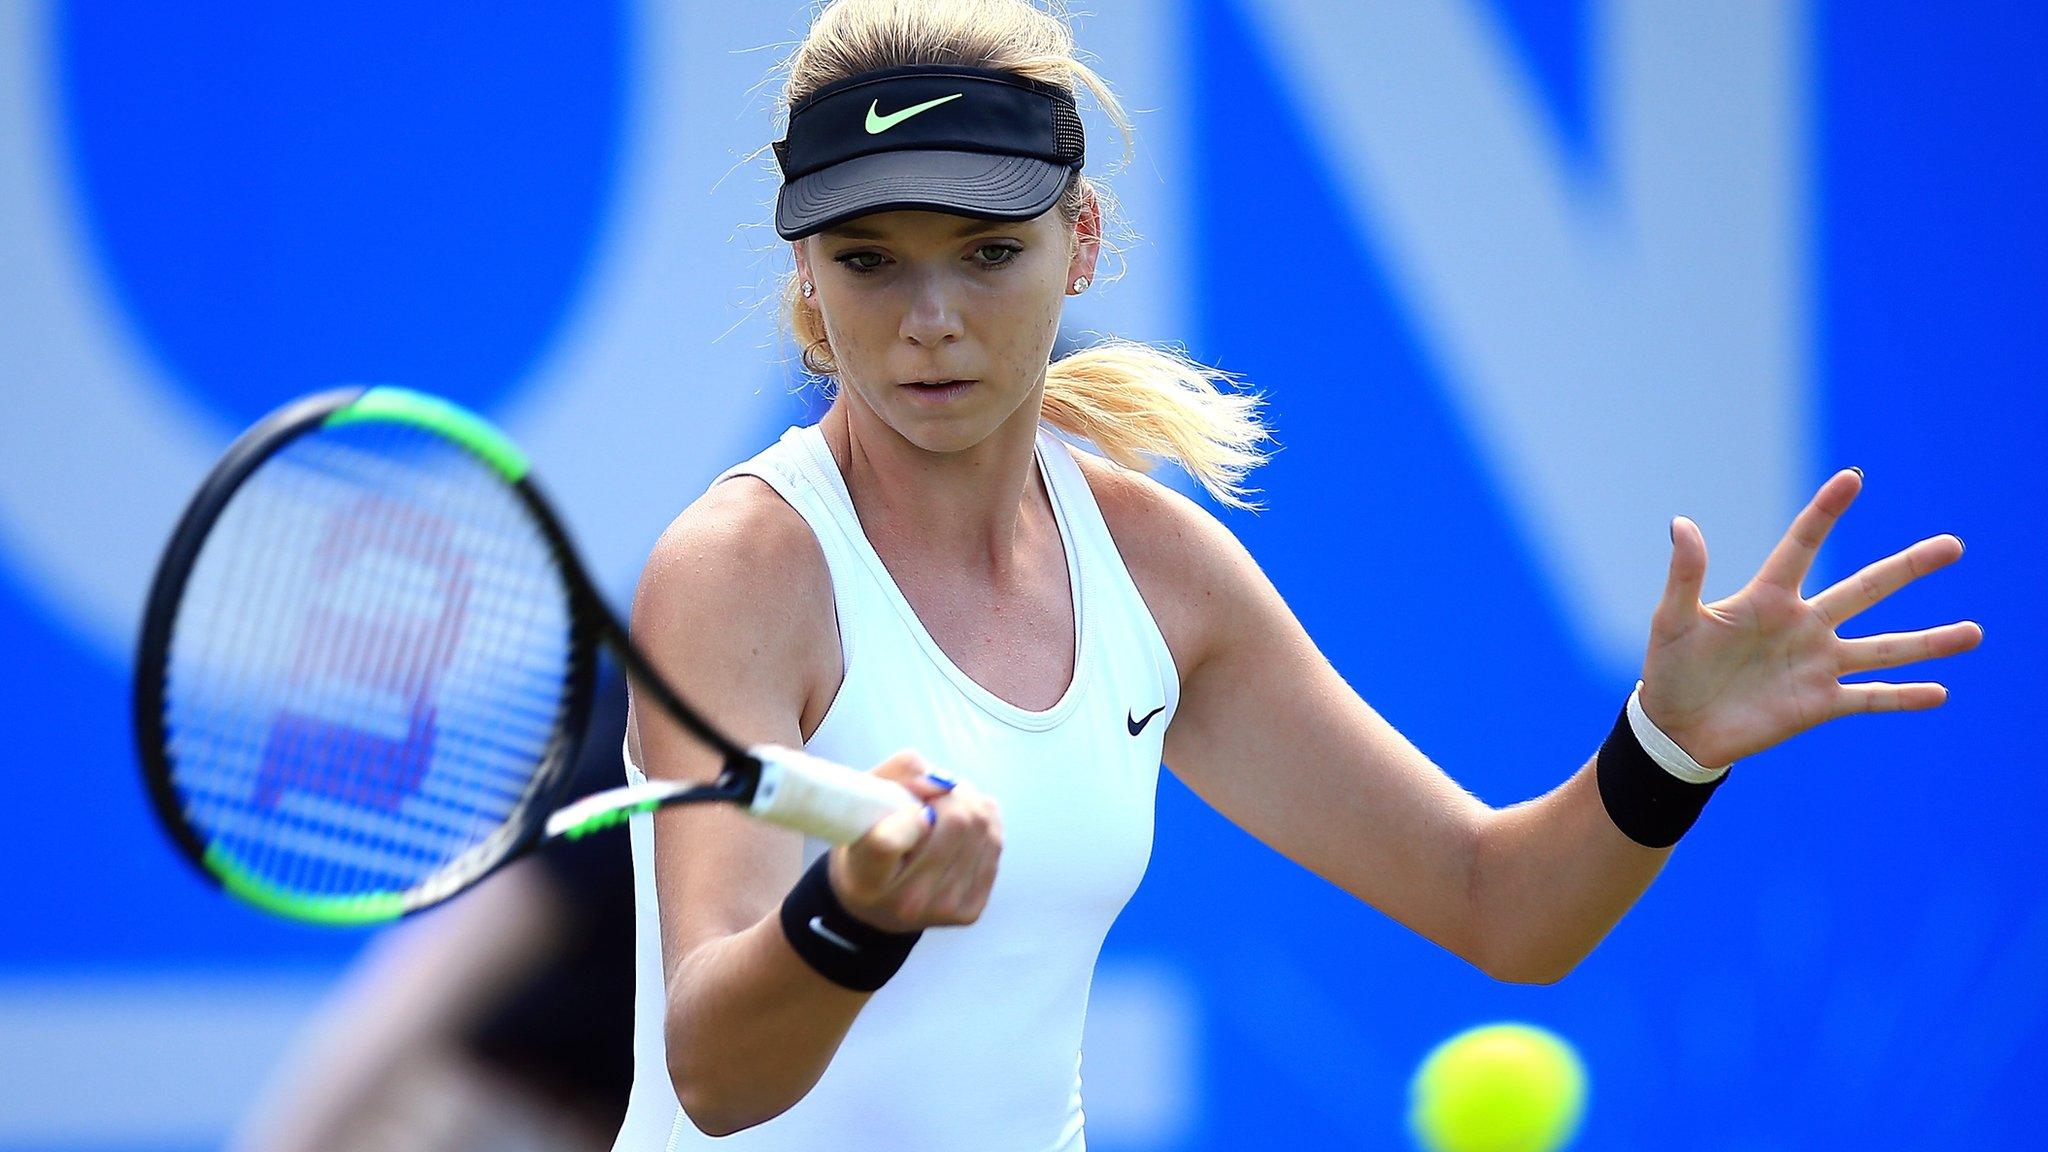 Wimbledon 2017: Katie Boulter will 'cherish' main draw experience